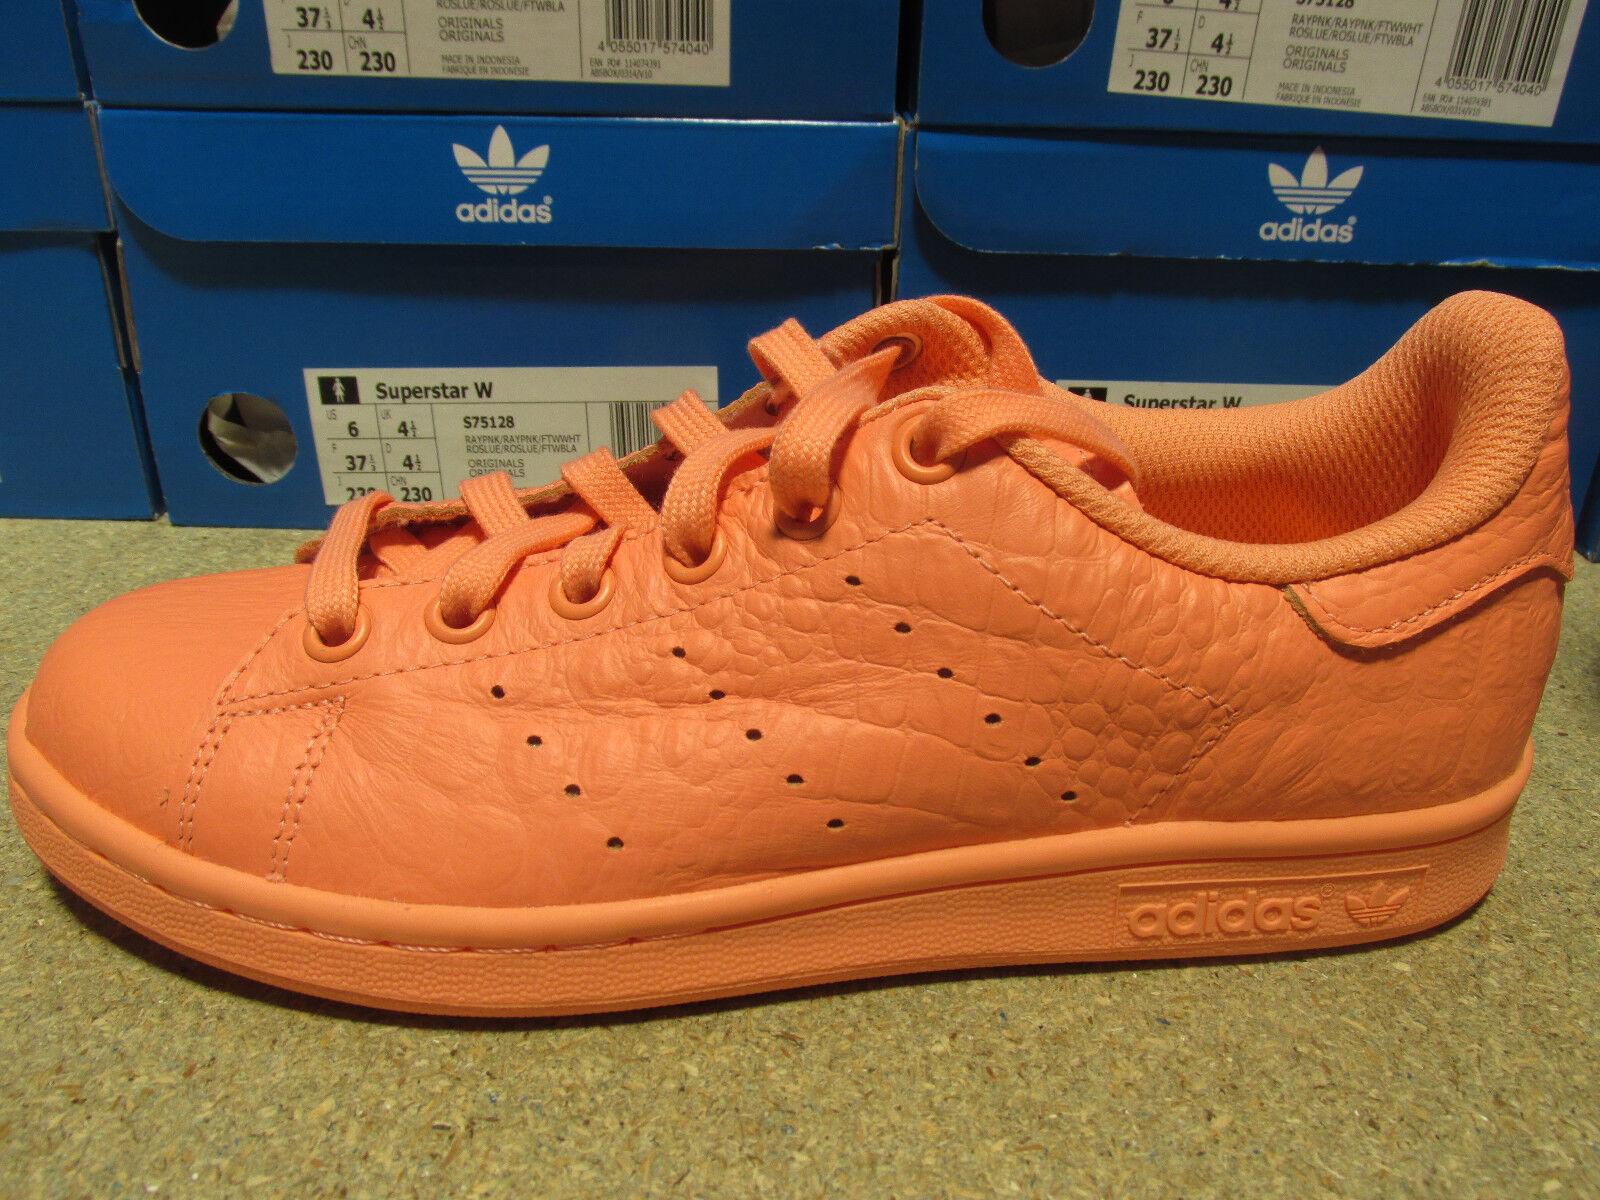 Adidas AQ6807 Originals Stan Smith Damen AQ6807 Adidas Turnschuhe Sneakers Schuhe ed38ef